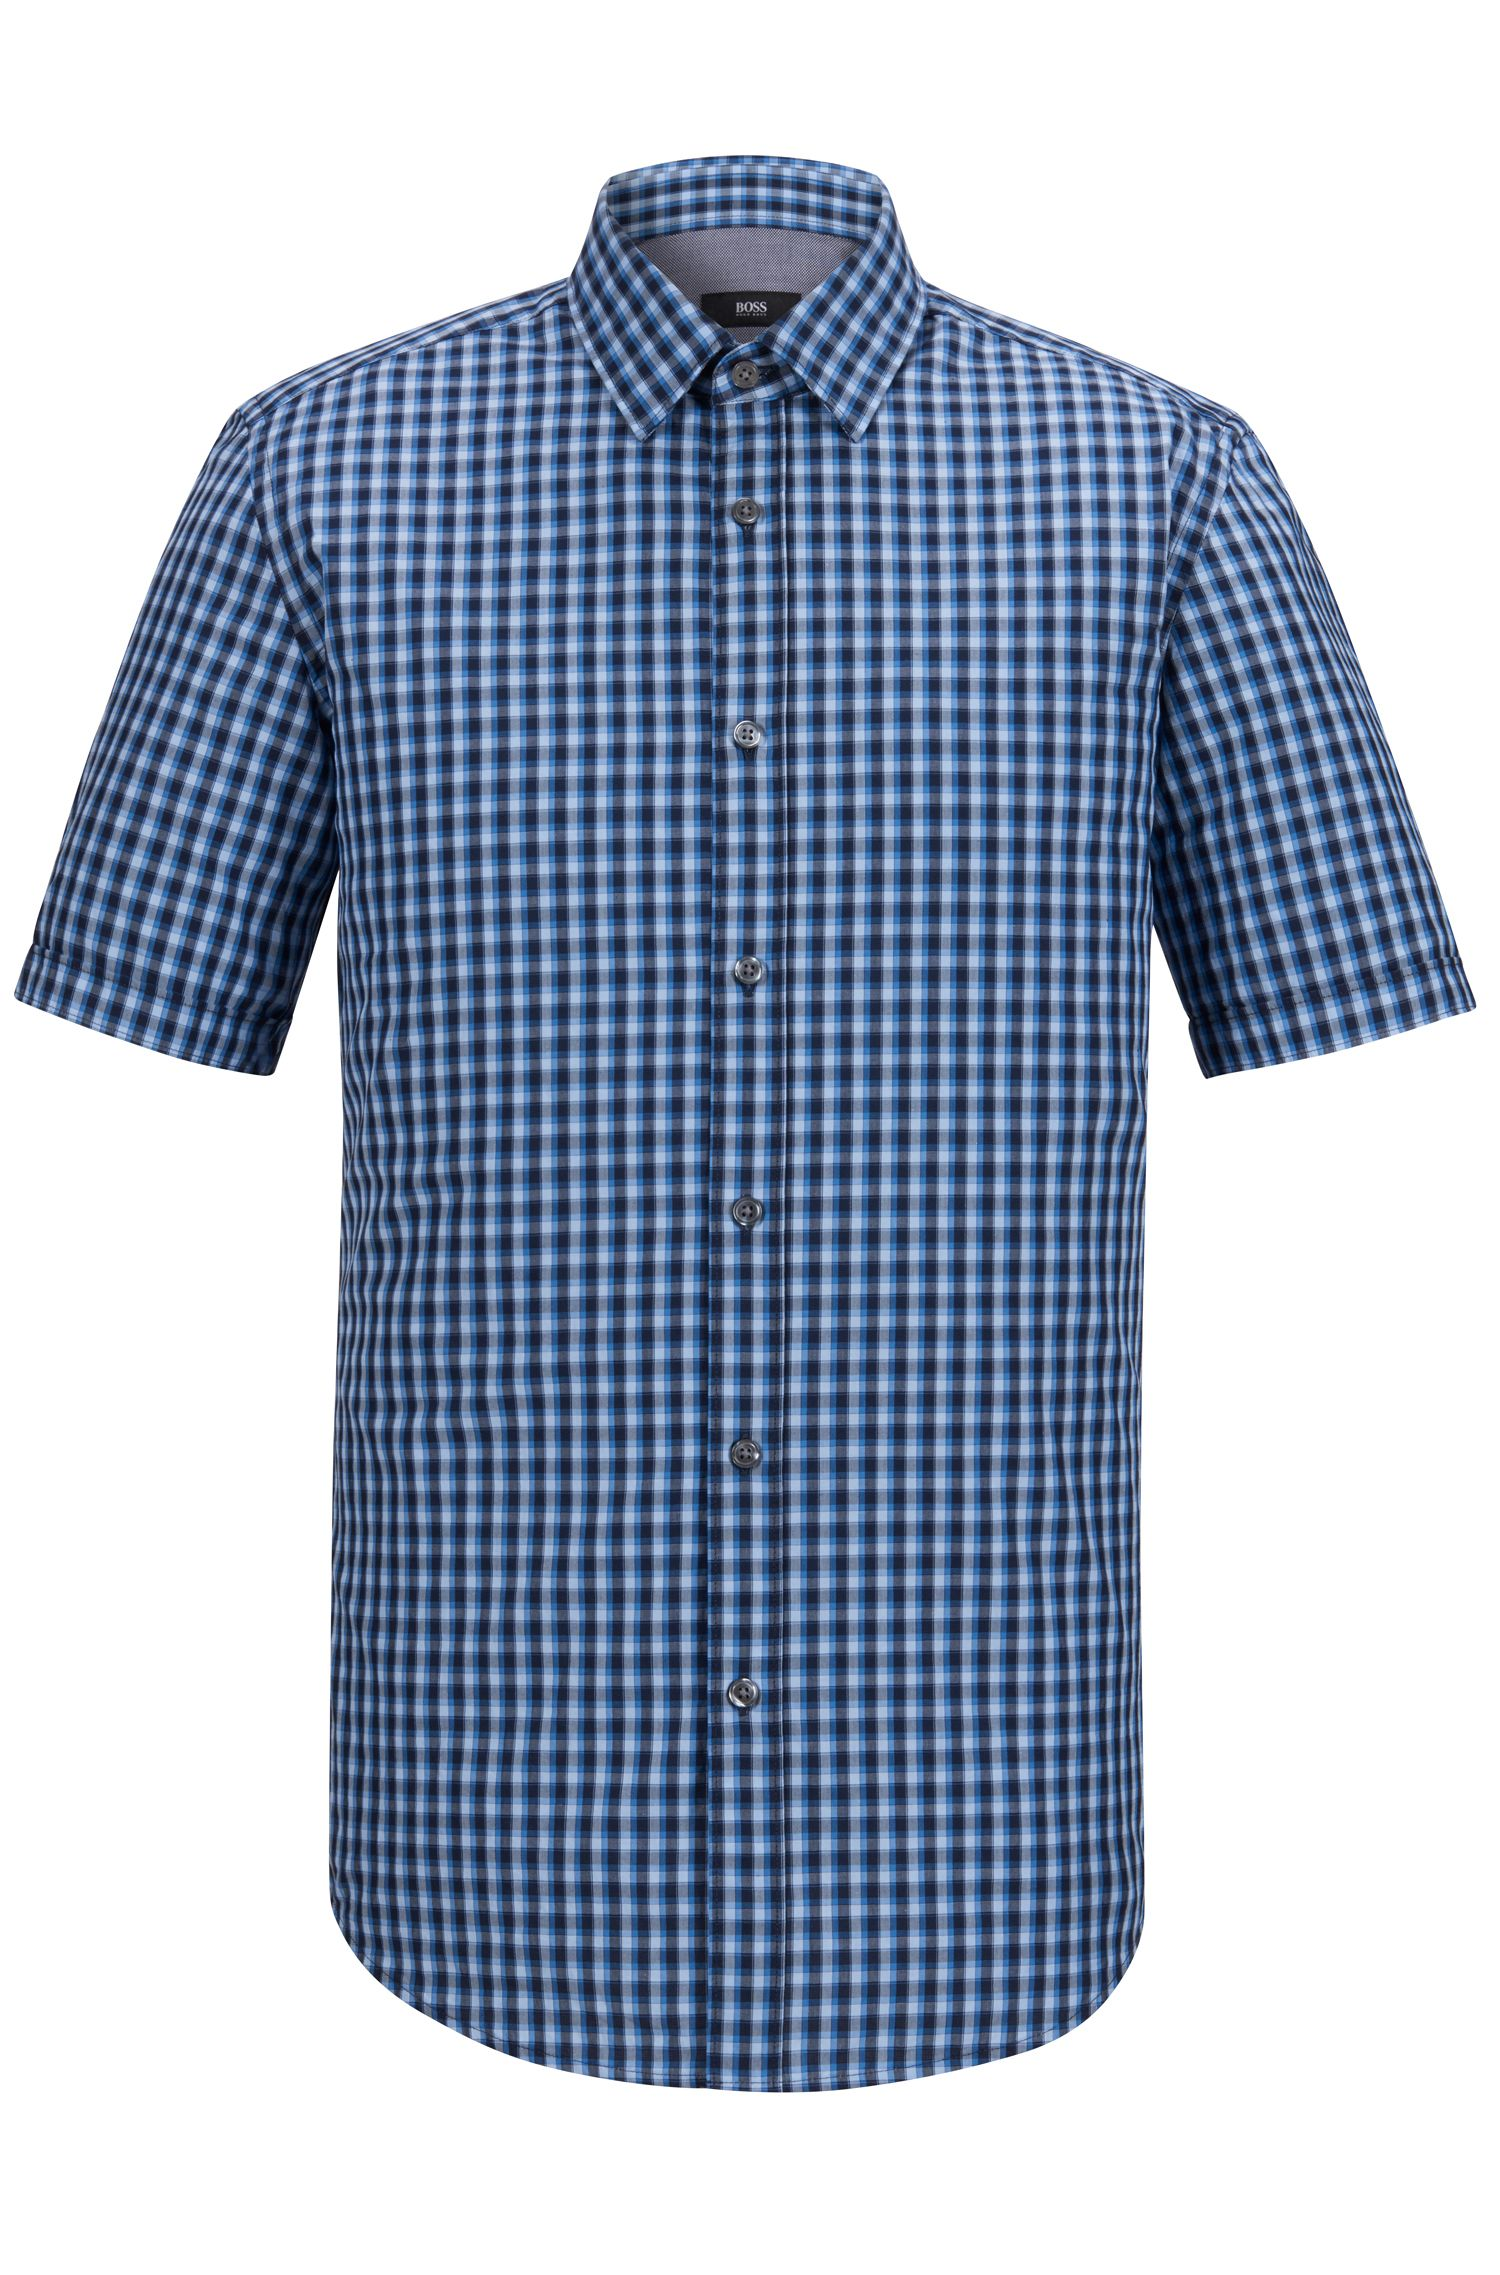 Check Cotton Button Down Shirt, Regular Fit | Luka